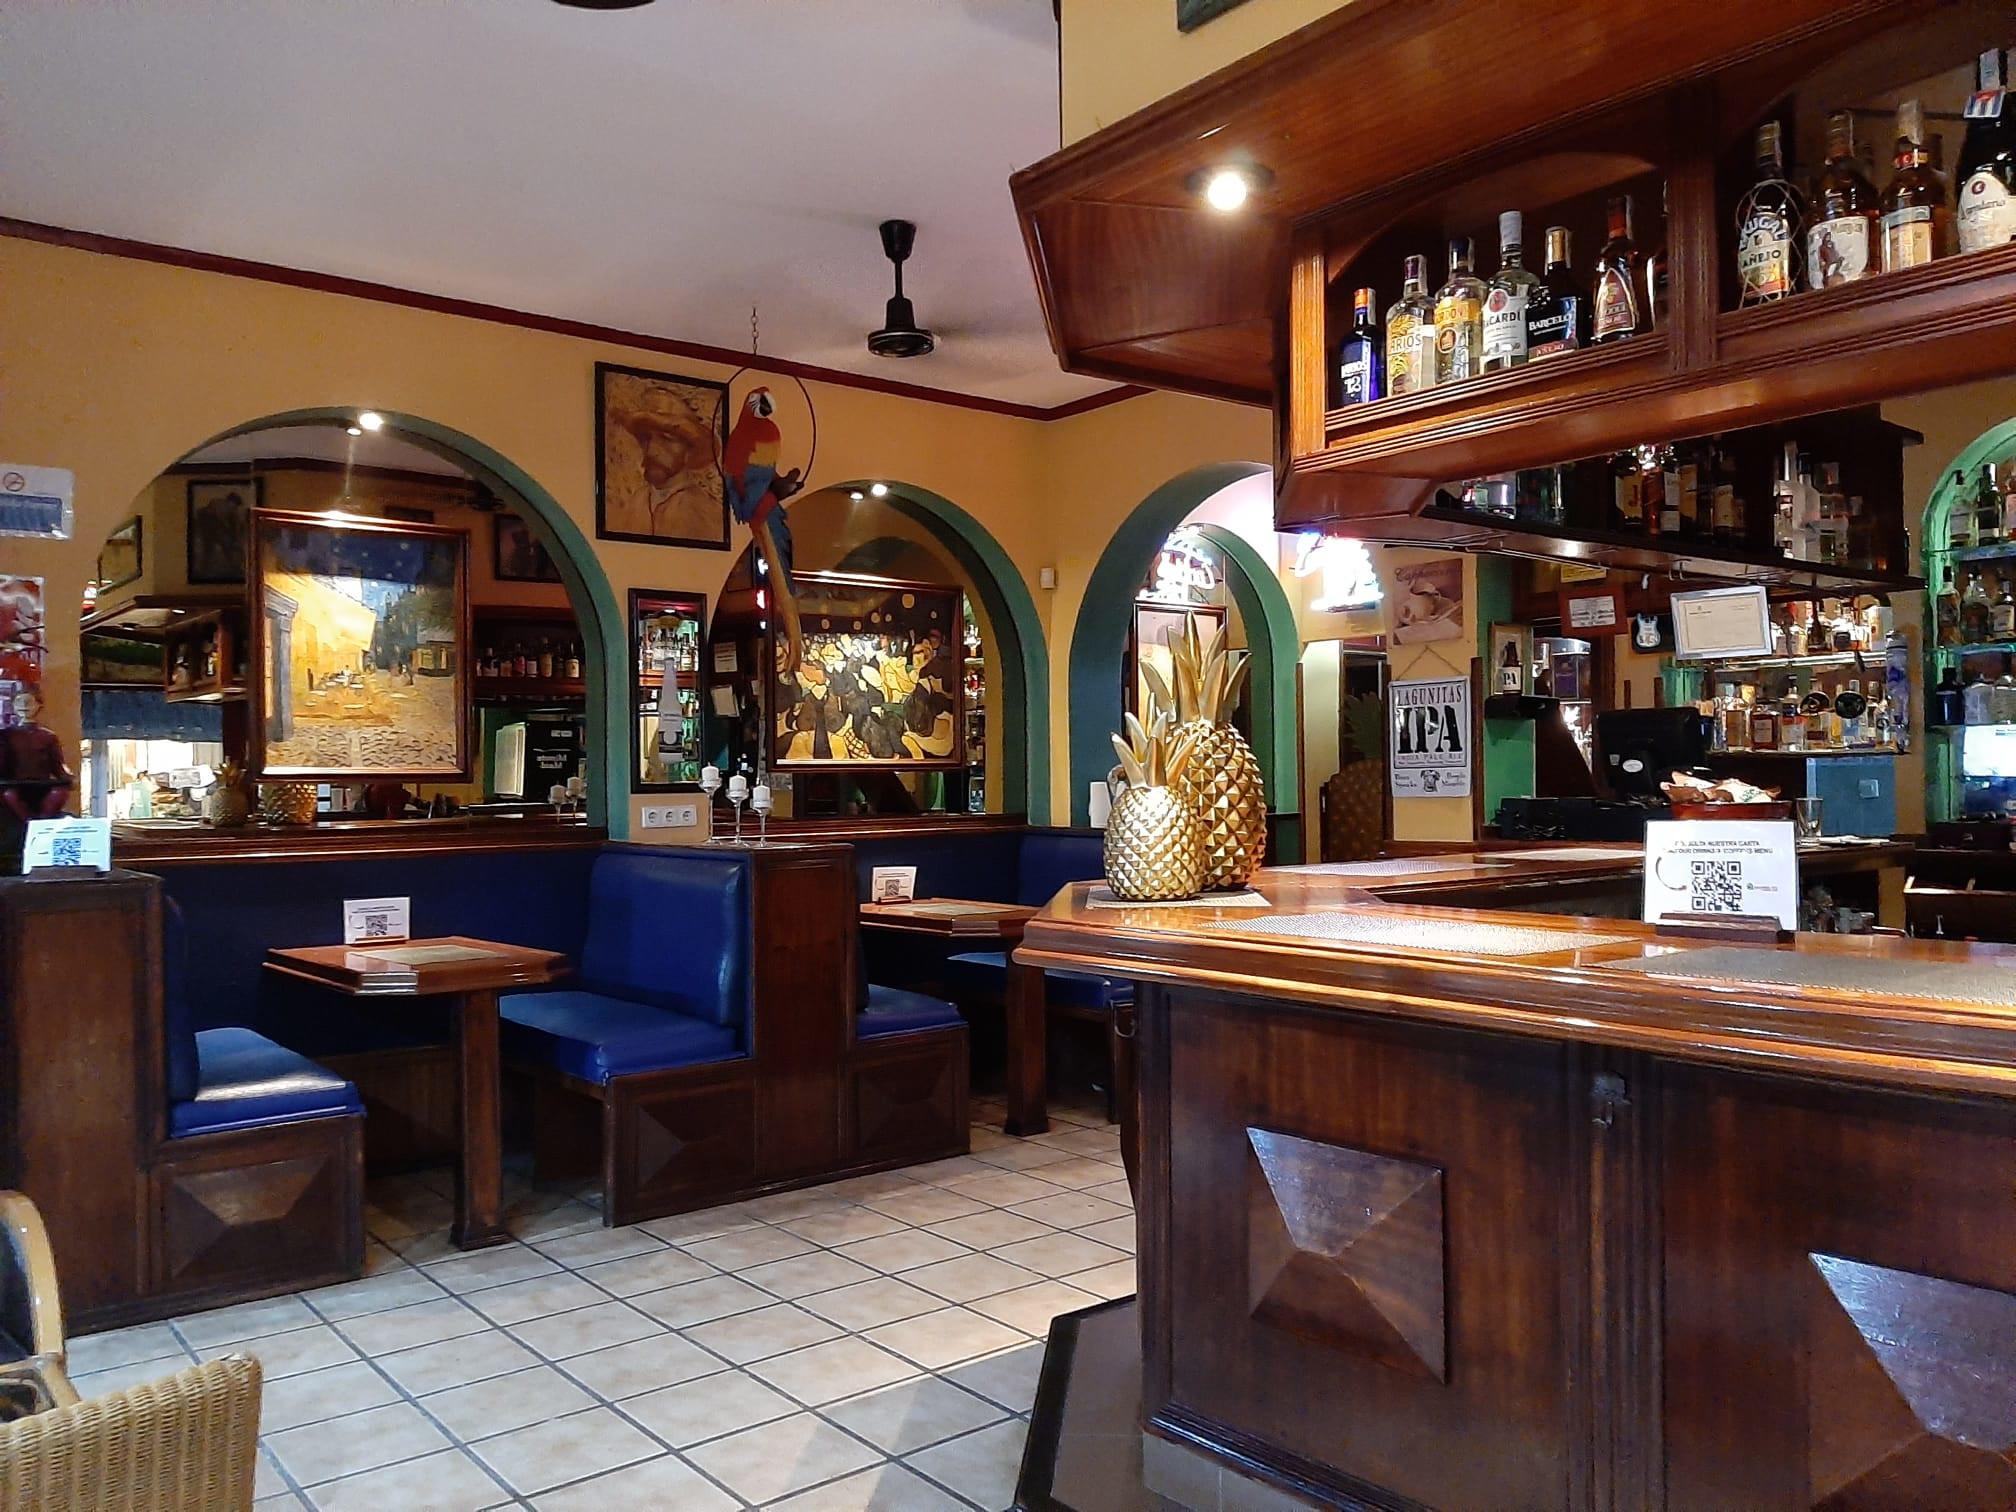 van-gogh-pub-interior